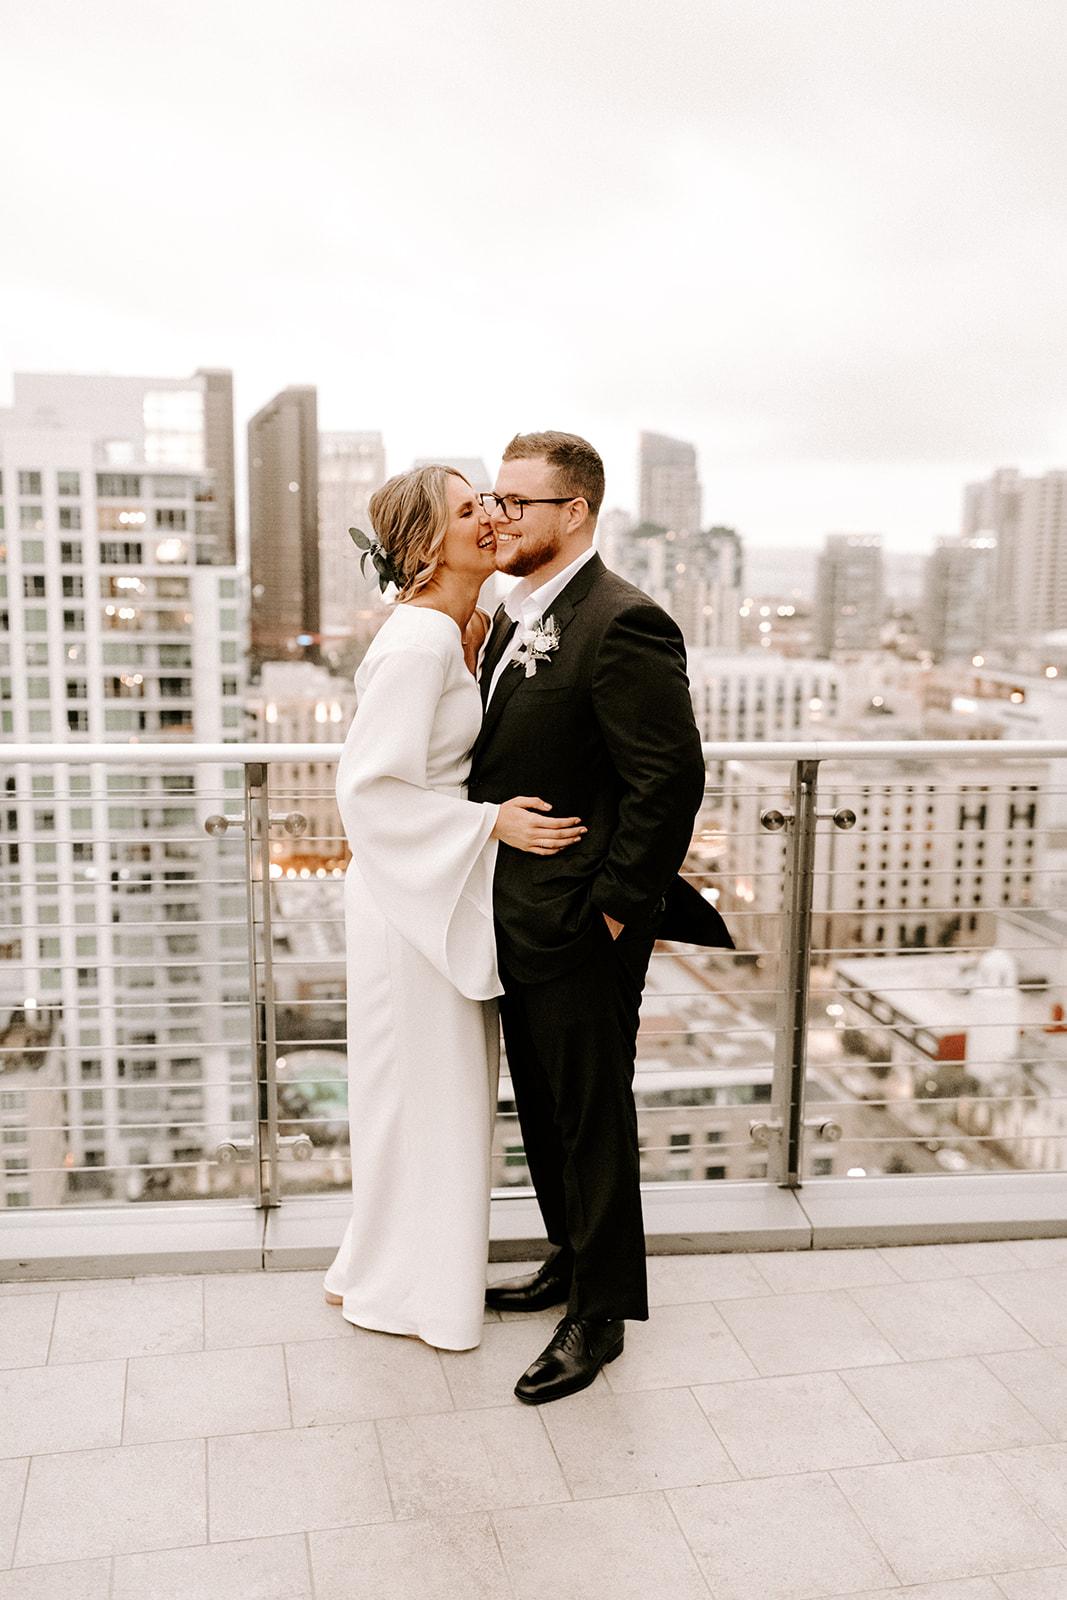 Mckenzie + Trevor The Ultimate Skybox Downtown San Diego Wedding Ellie Cole Photographer-662-2.jpg